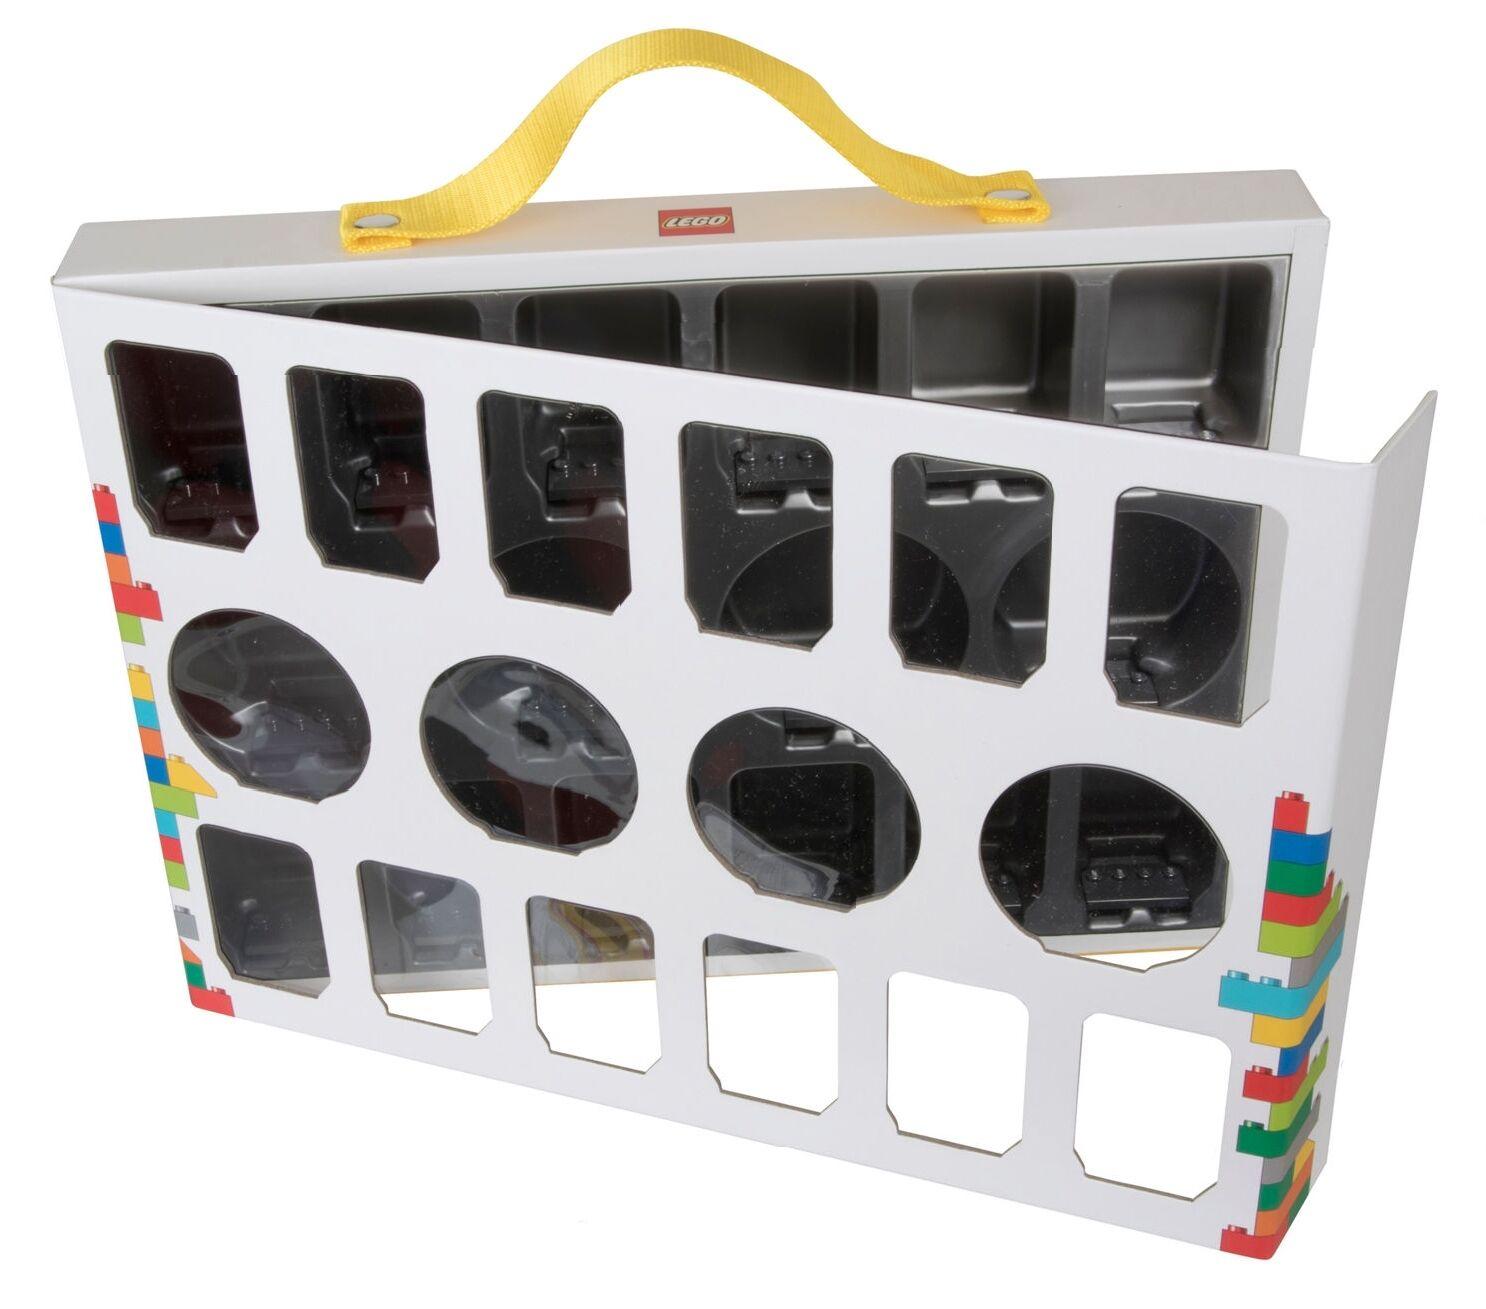 LEGO 851399-Minifigurenkoffer 851399-Minifigurenkoffer 851399-Minifigurenkoffer mit Tragegriff für 16 Minifiguren-Koffer-neu-new c3bc09